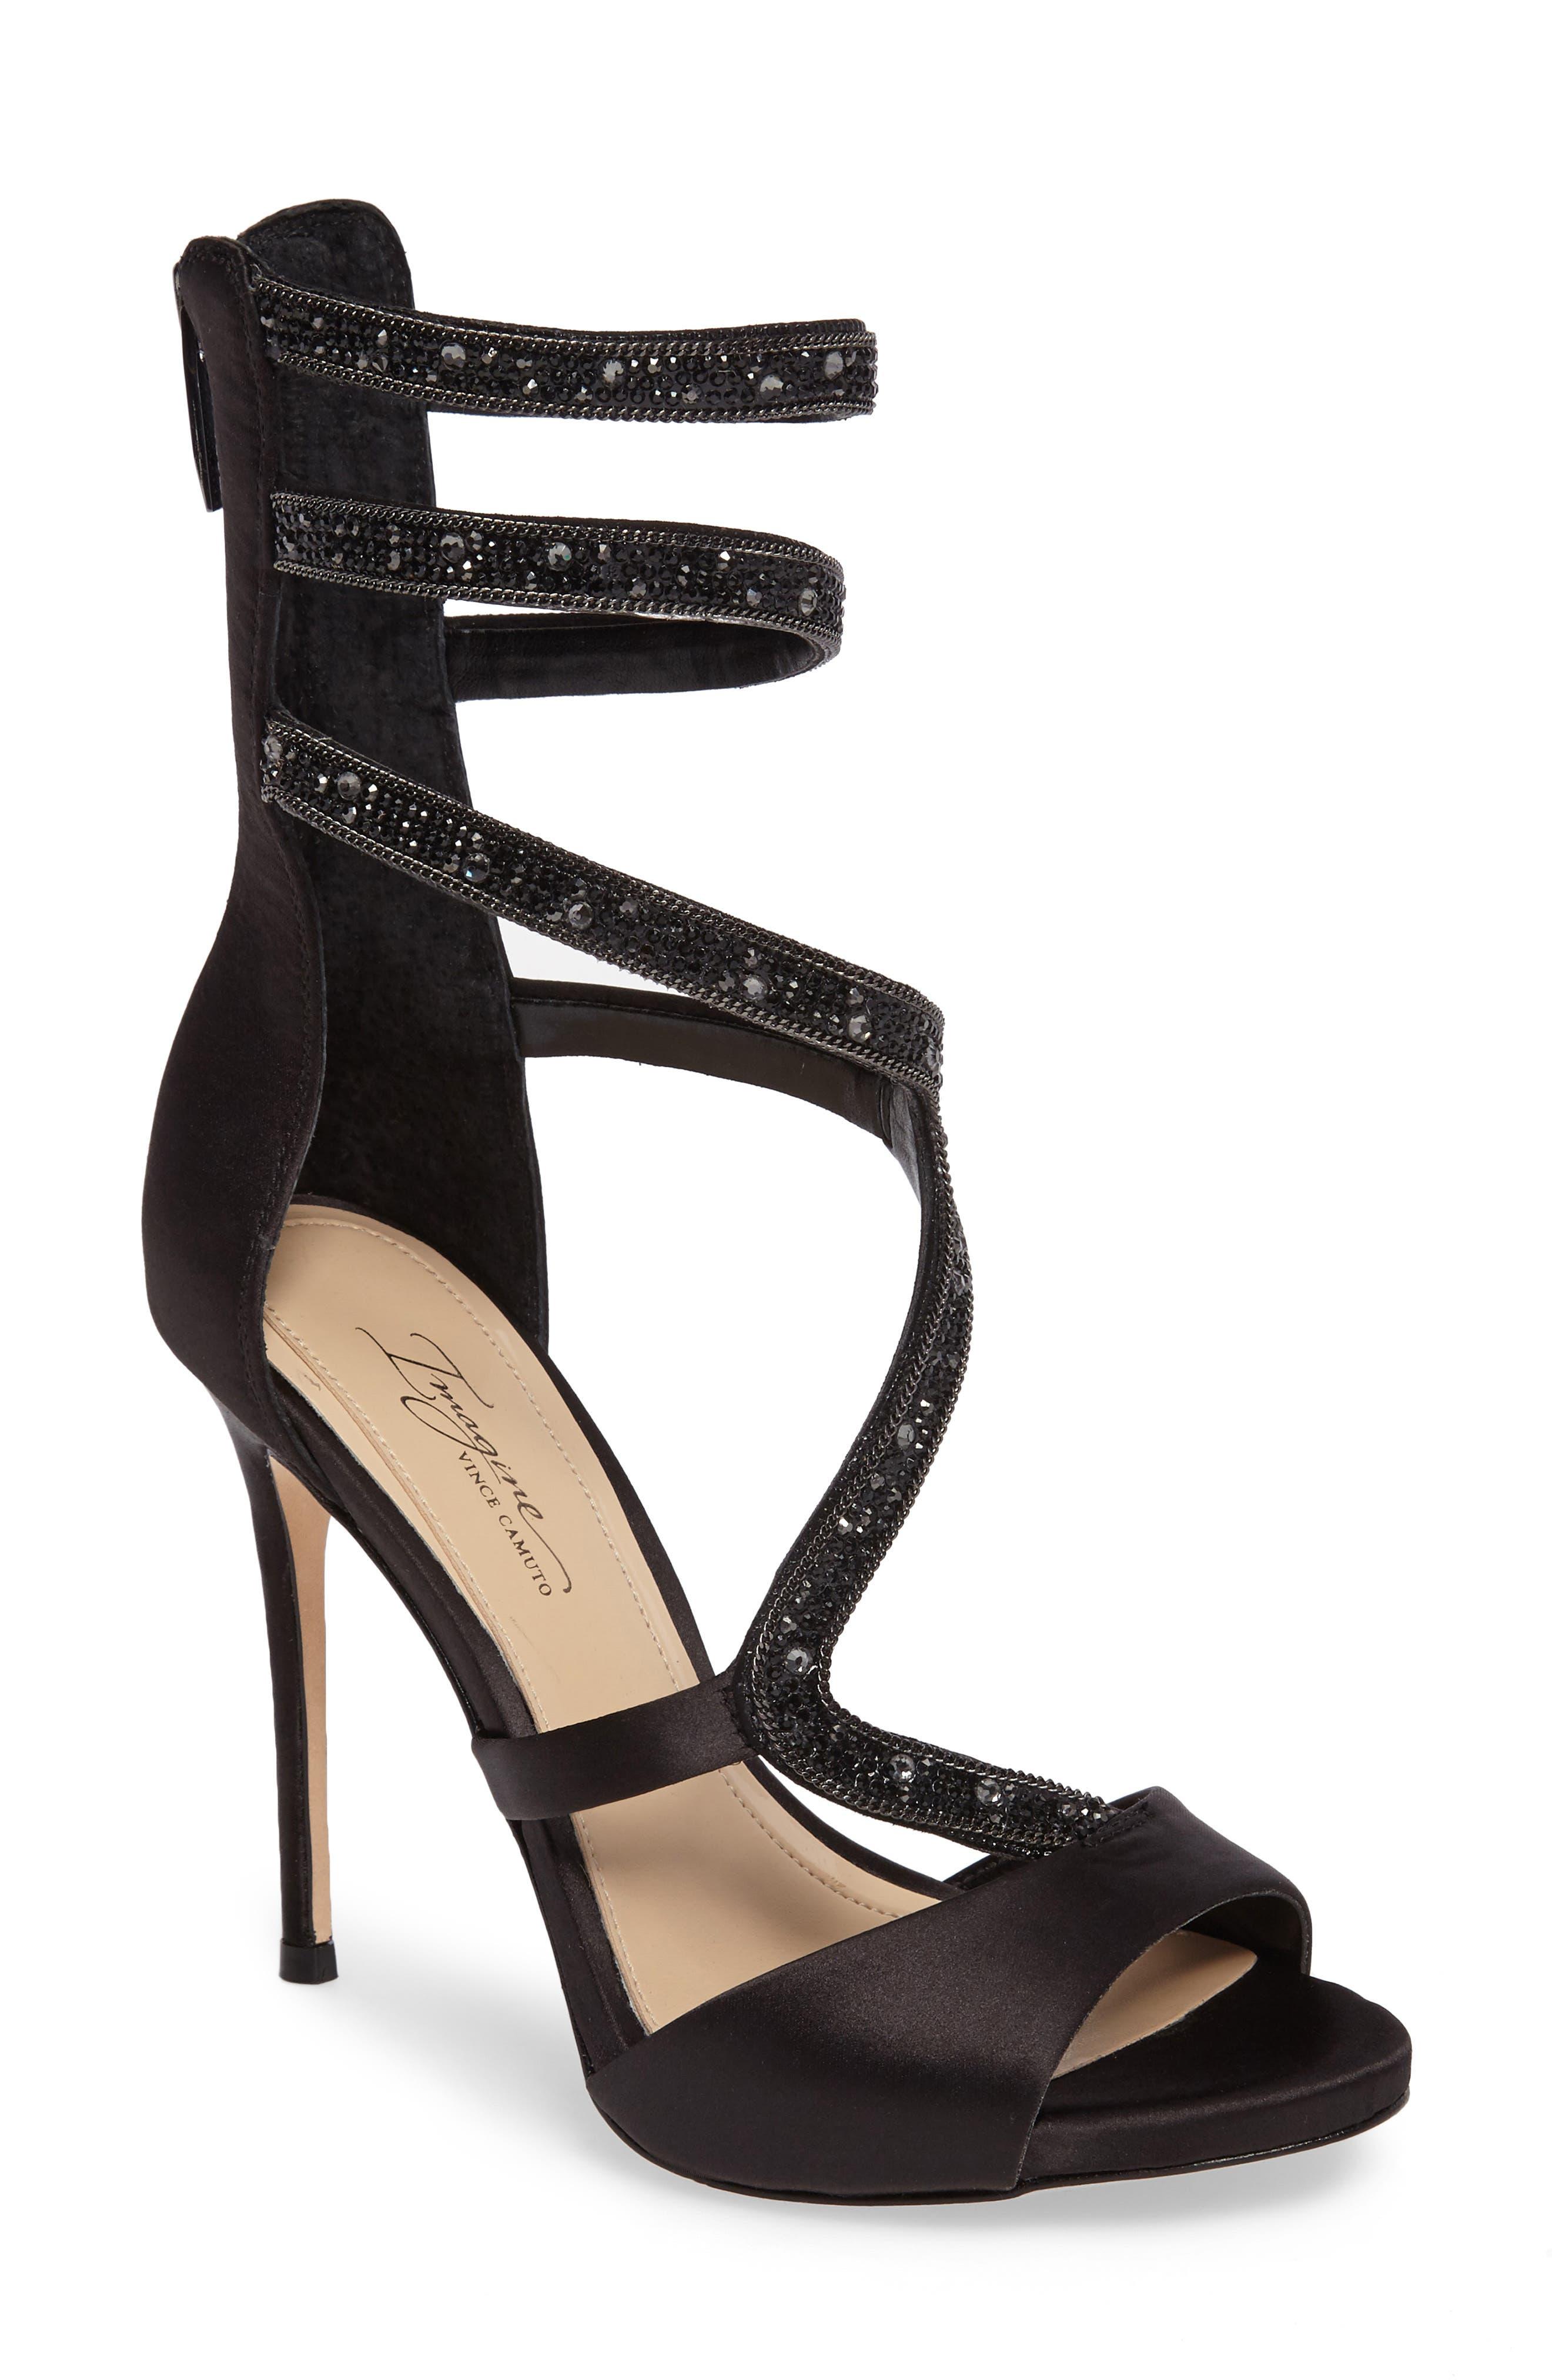 Imagine Vince Camuto Women/'s Dafny Heeled Sandal